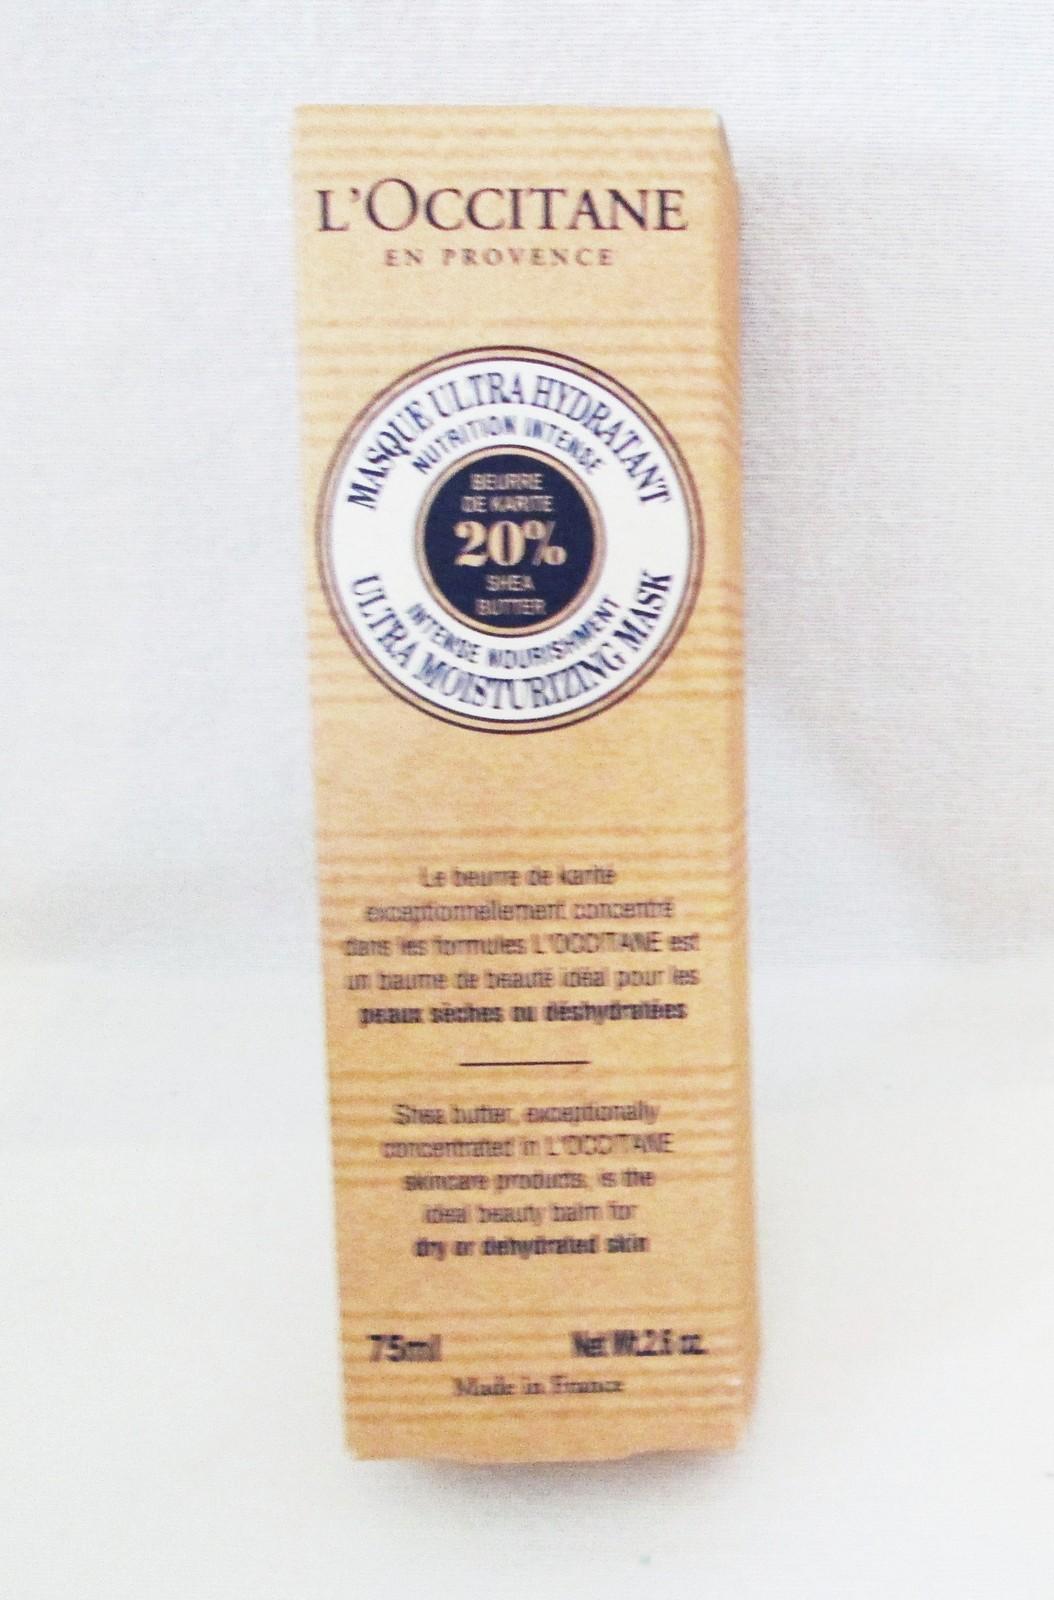 L'Occitane Ultra Moisturizing Mask 20% Shea. Boxed